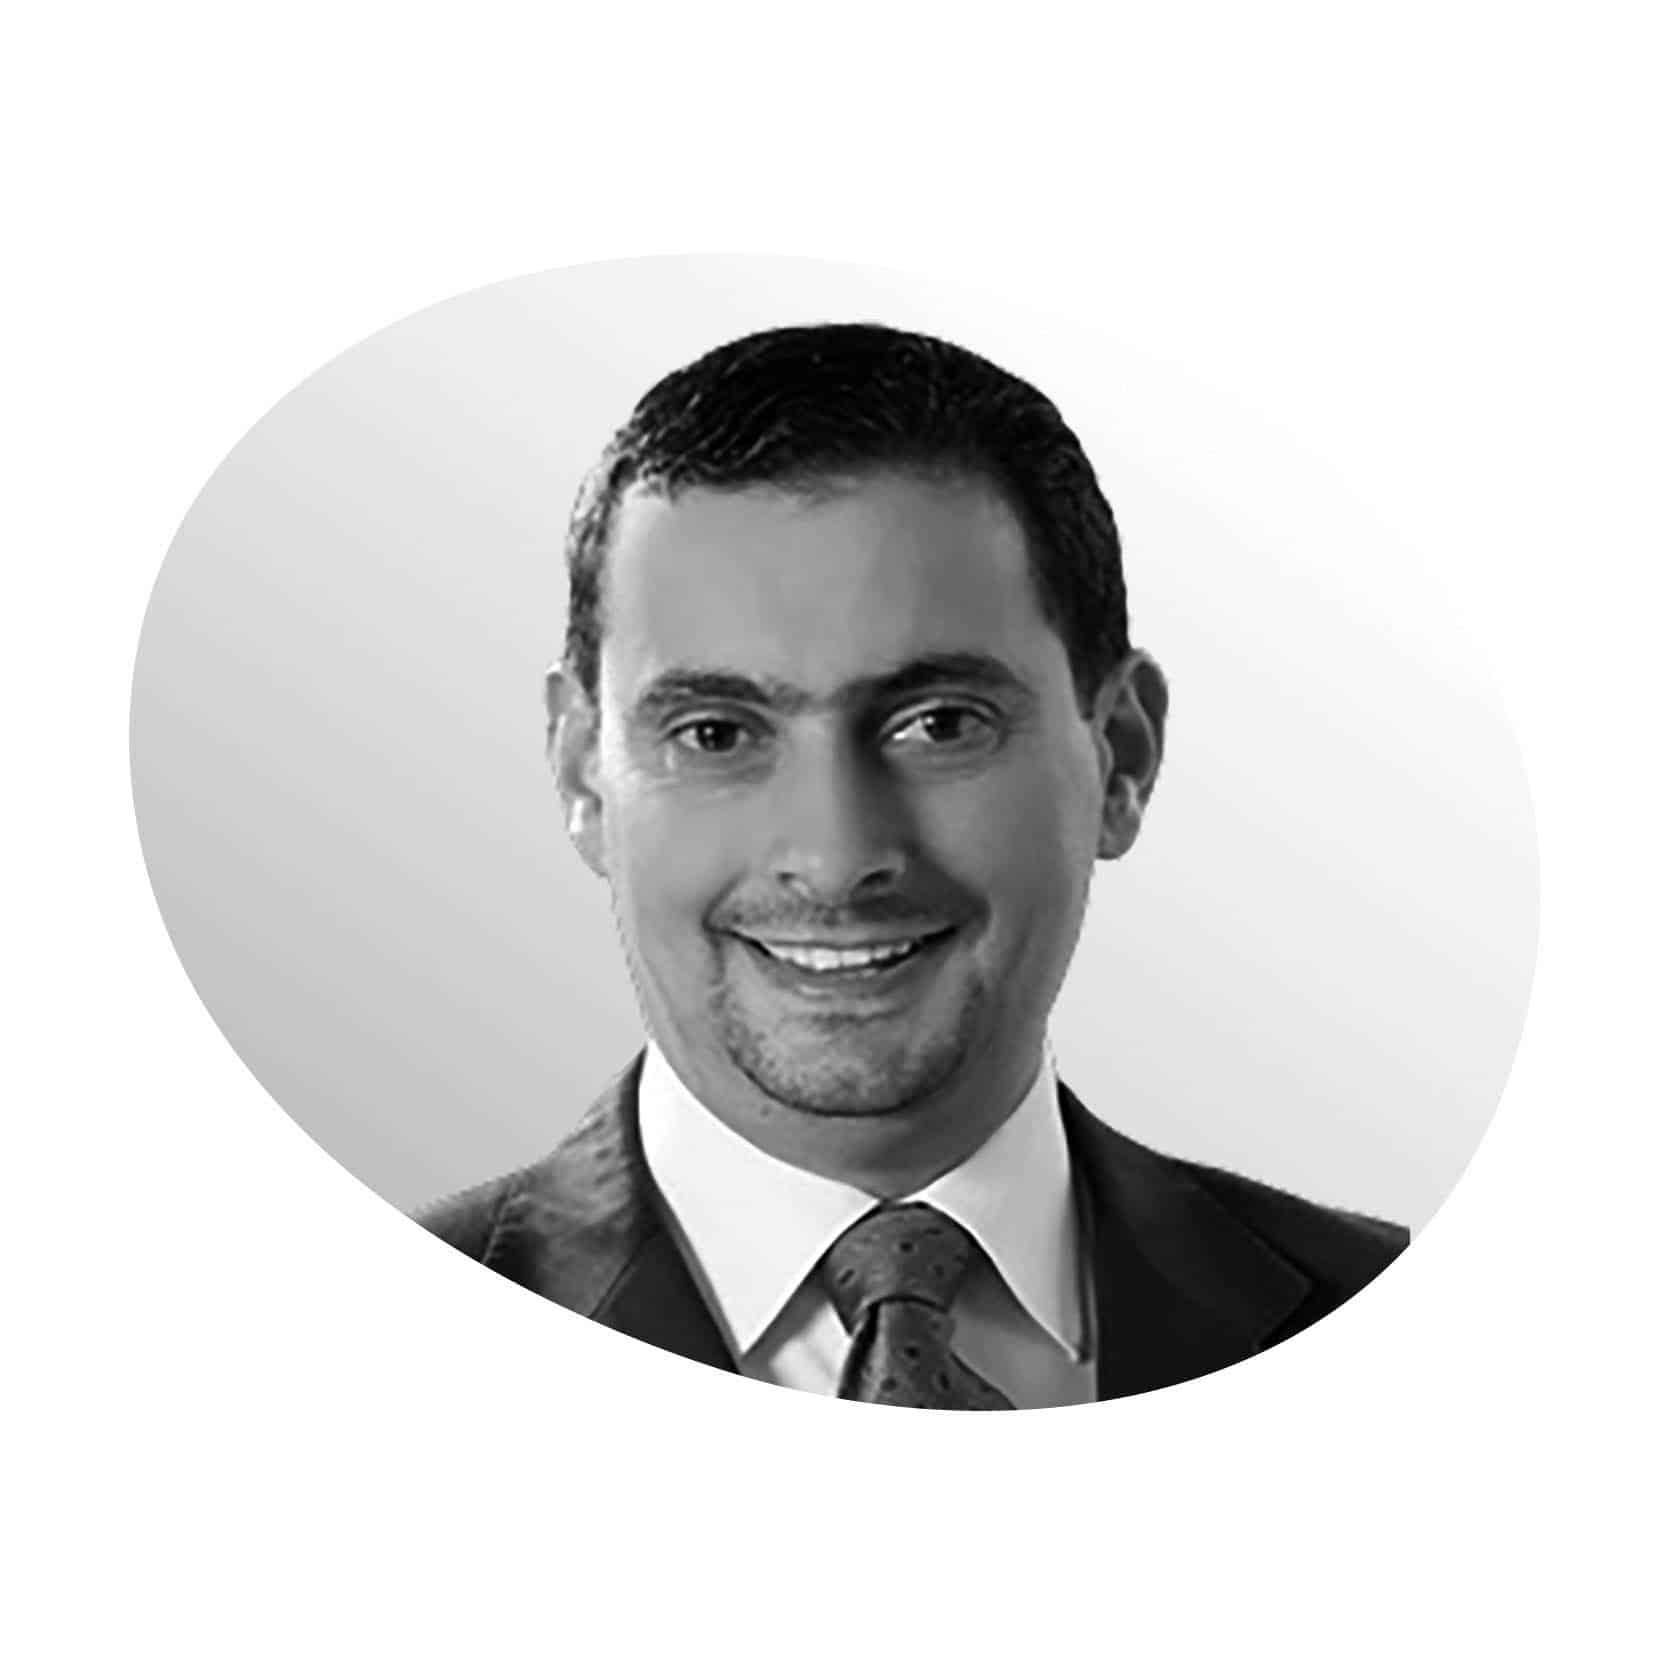 Mr Tariq Hamouri